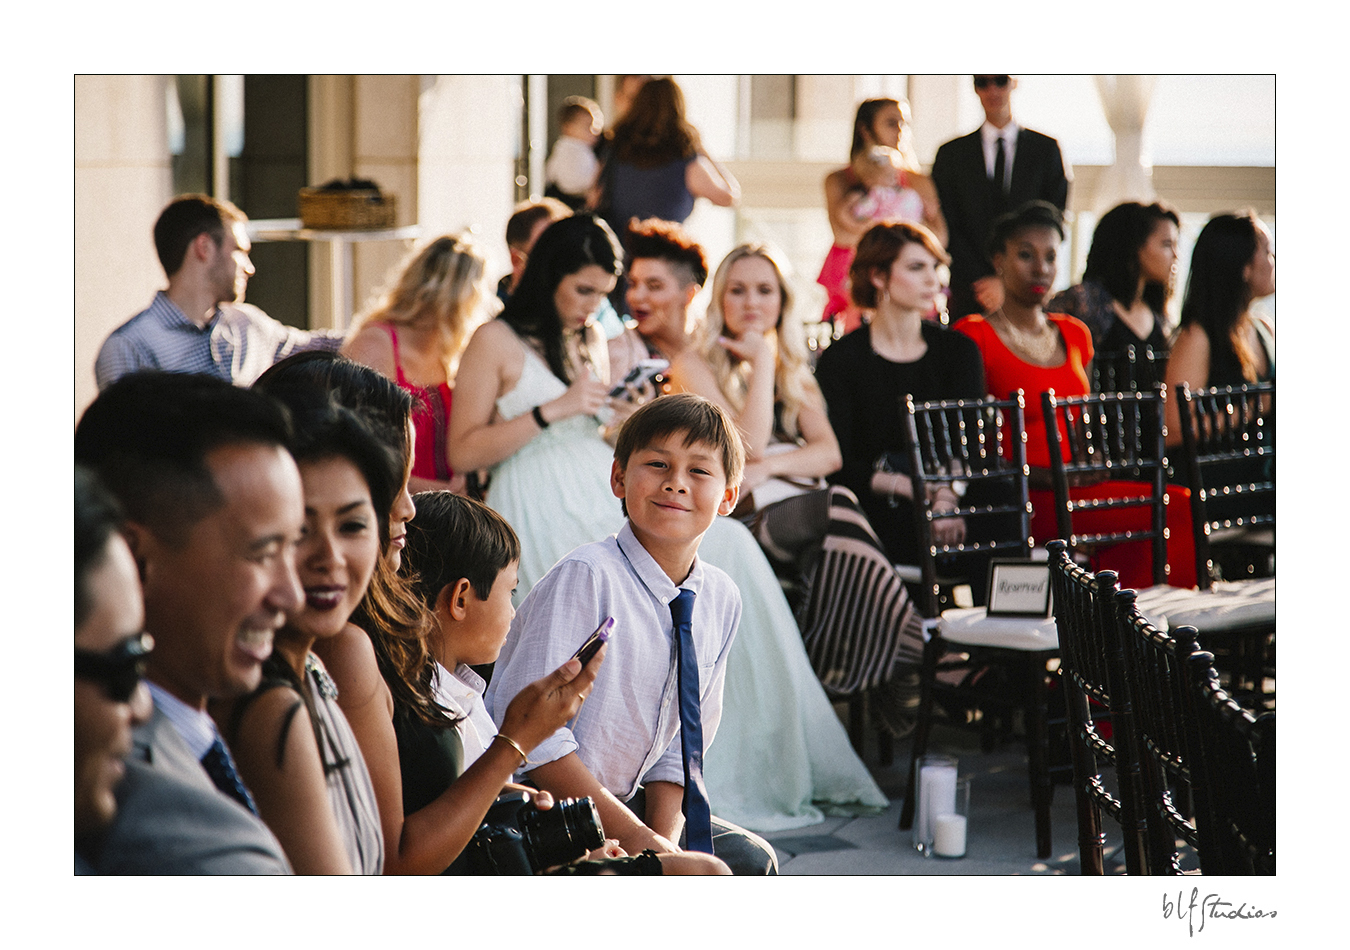 0013-blfstudios-wedding-photographer-daniel-danielle-atlanta.jpg